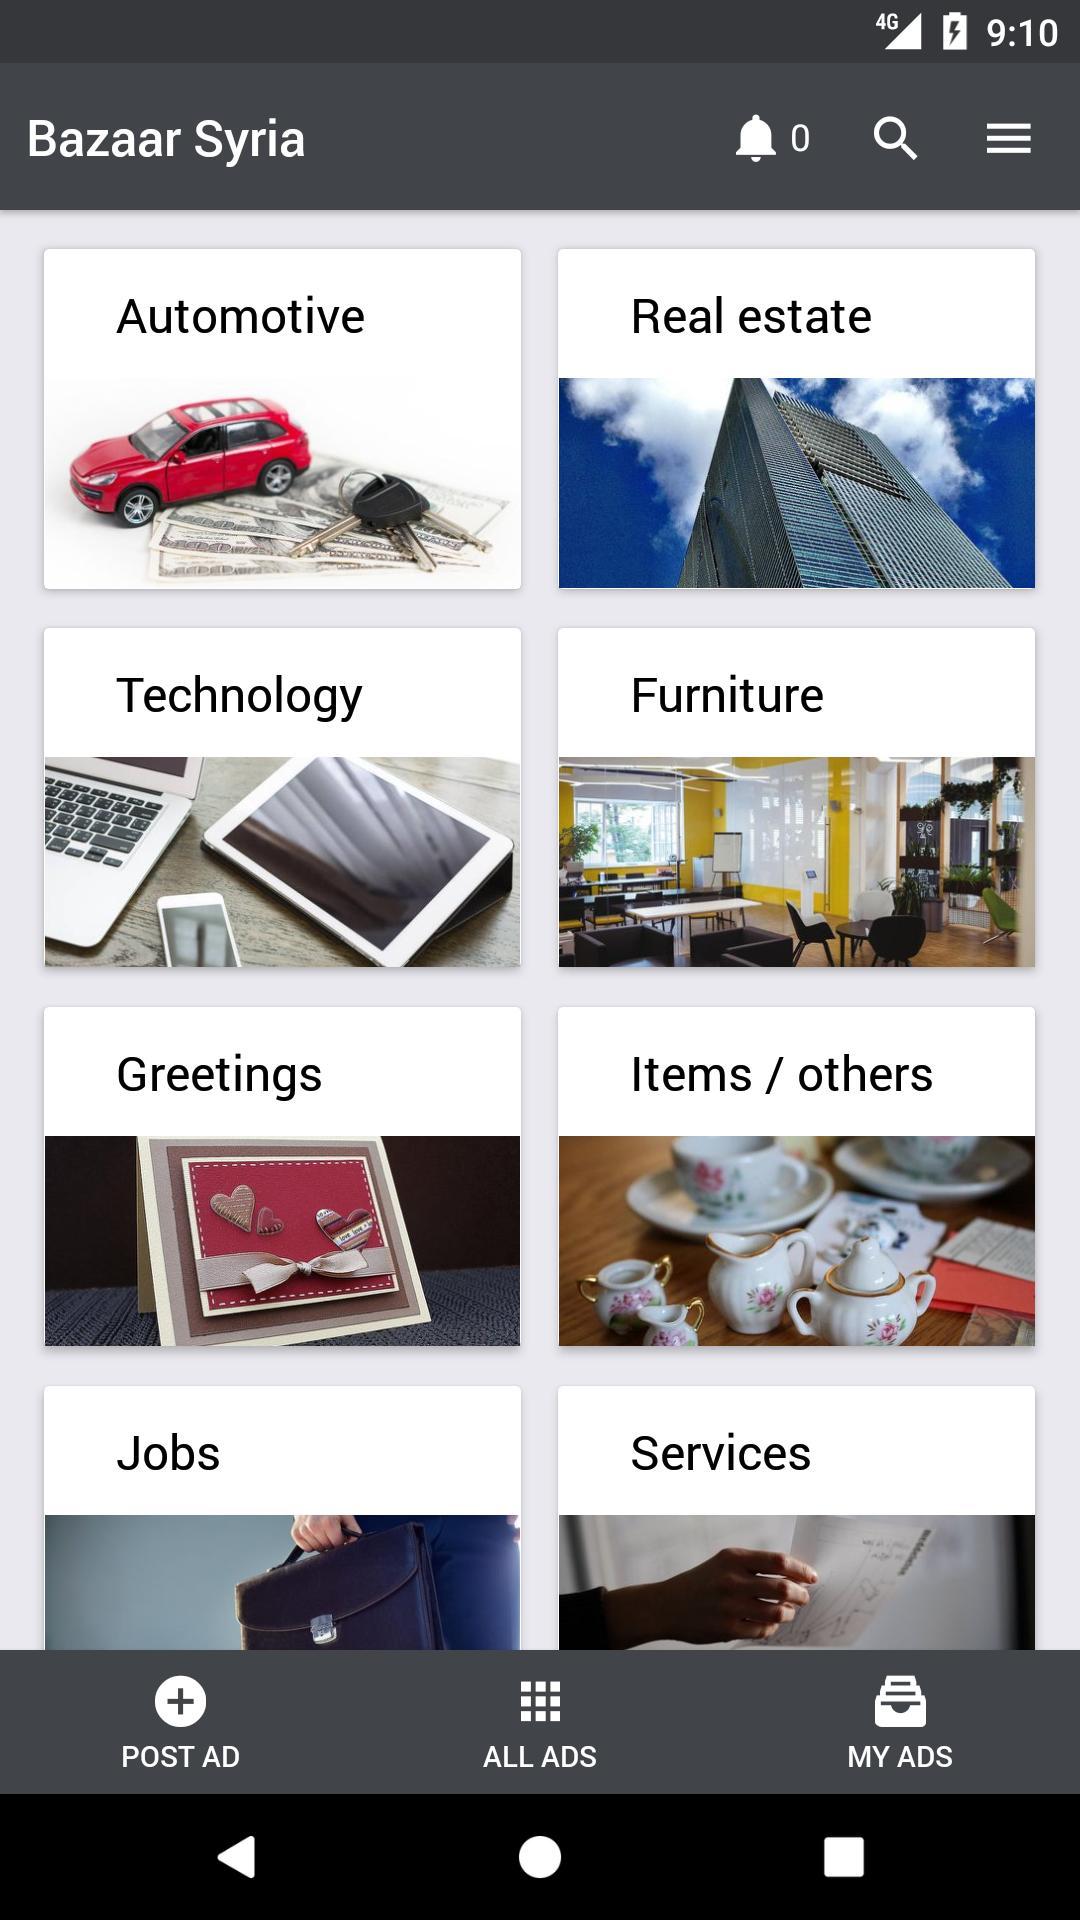 بازار سوريا Bazaar Syria for Android - APK Download